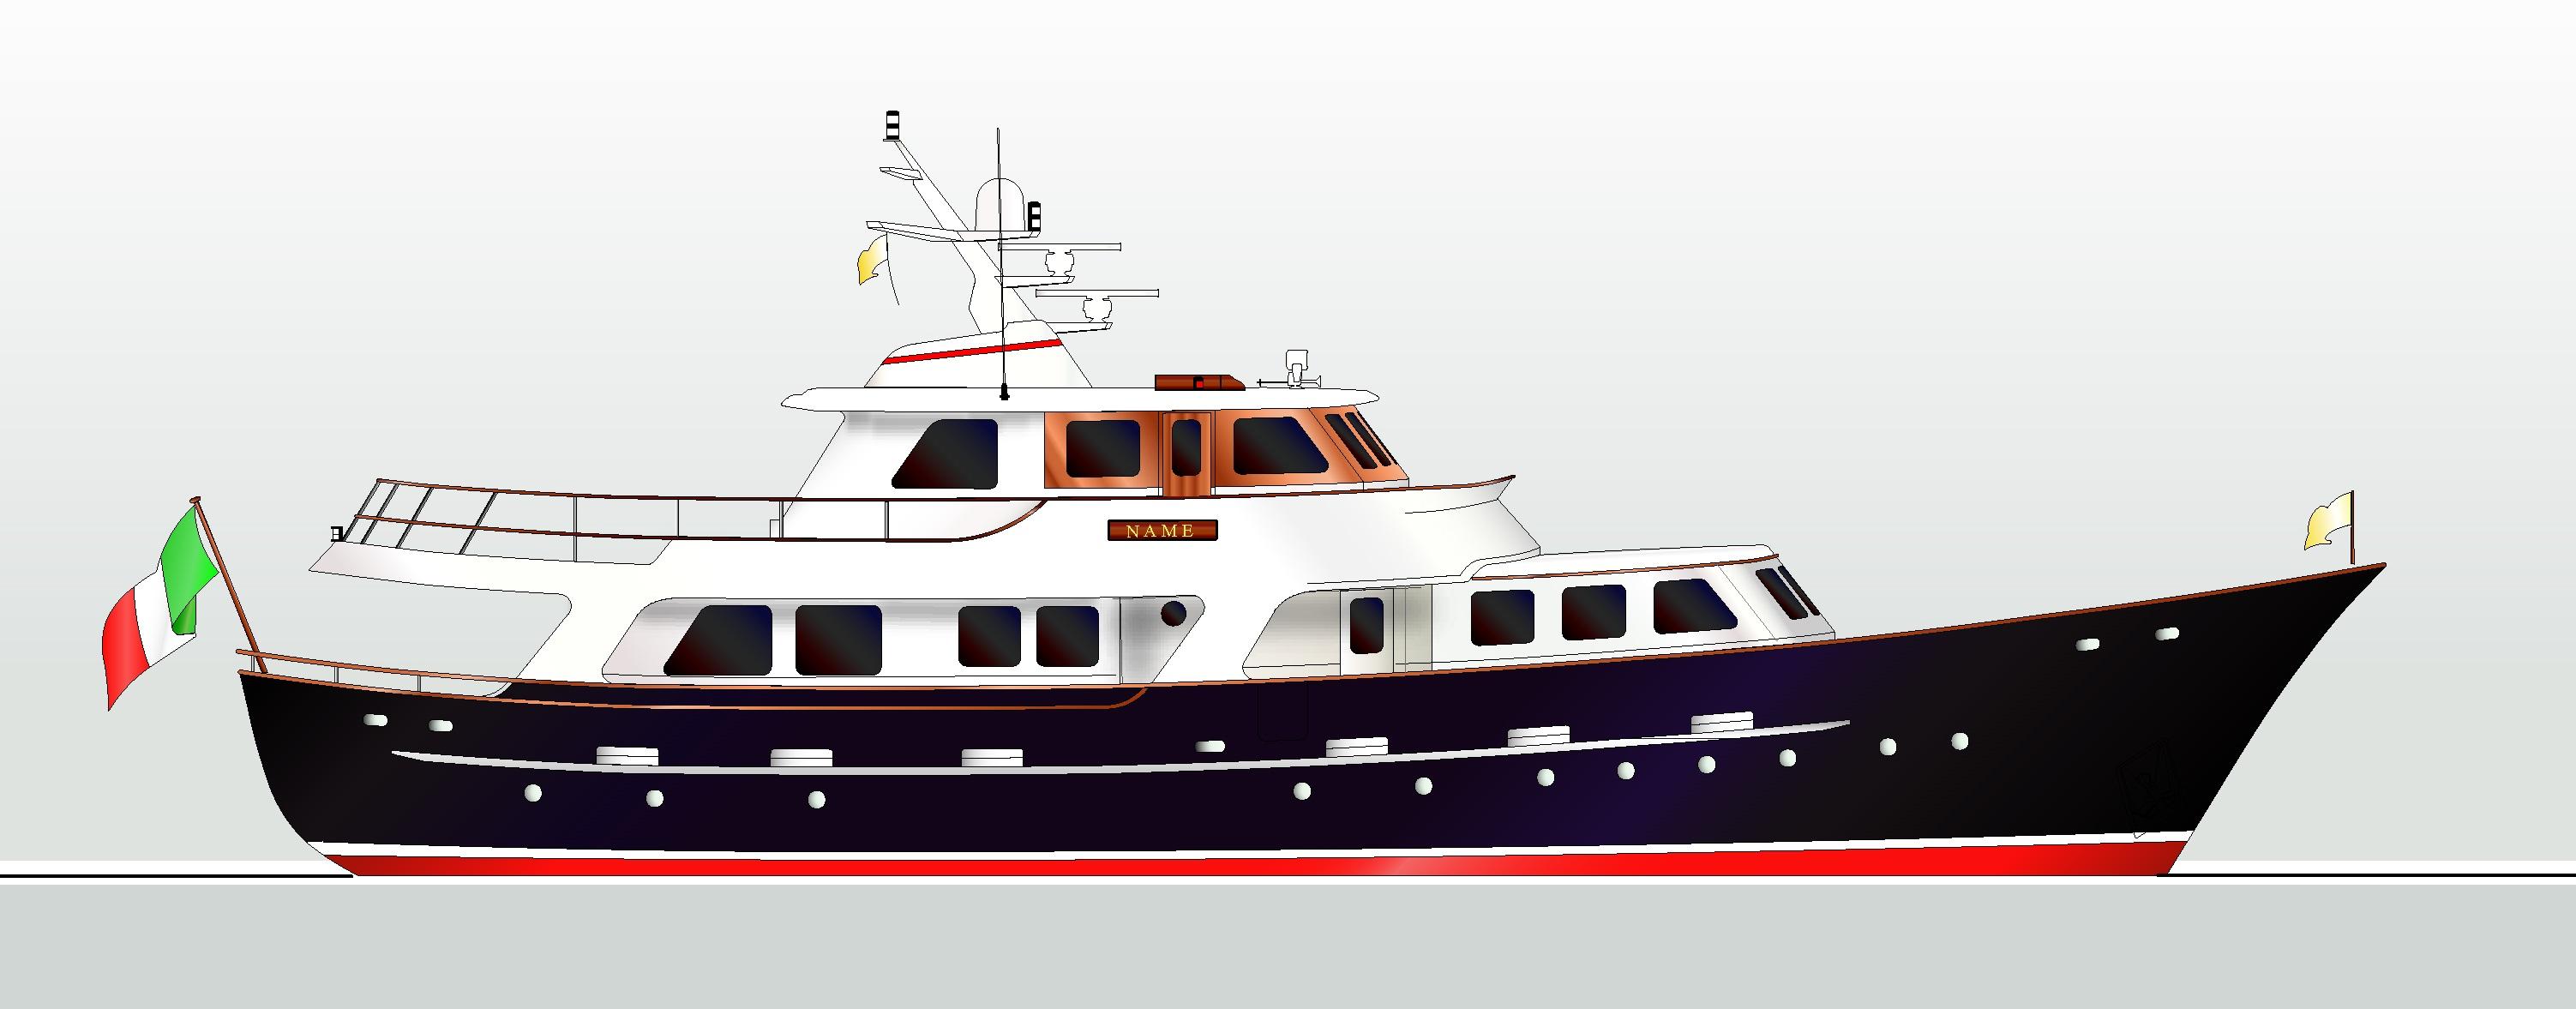 E-1107, 26,6 m Motorboat